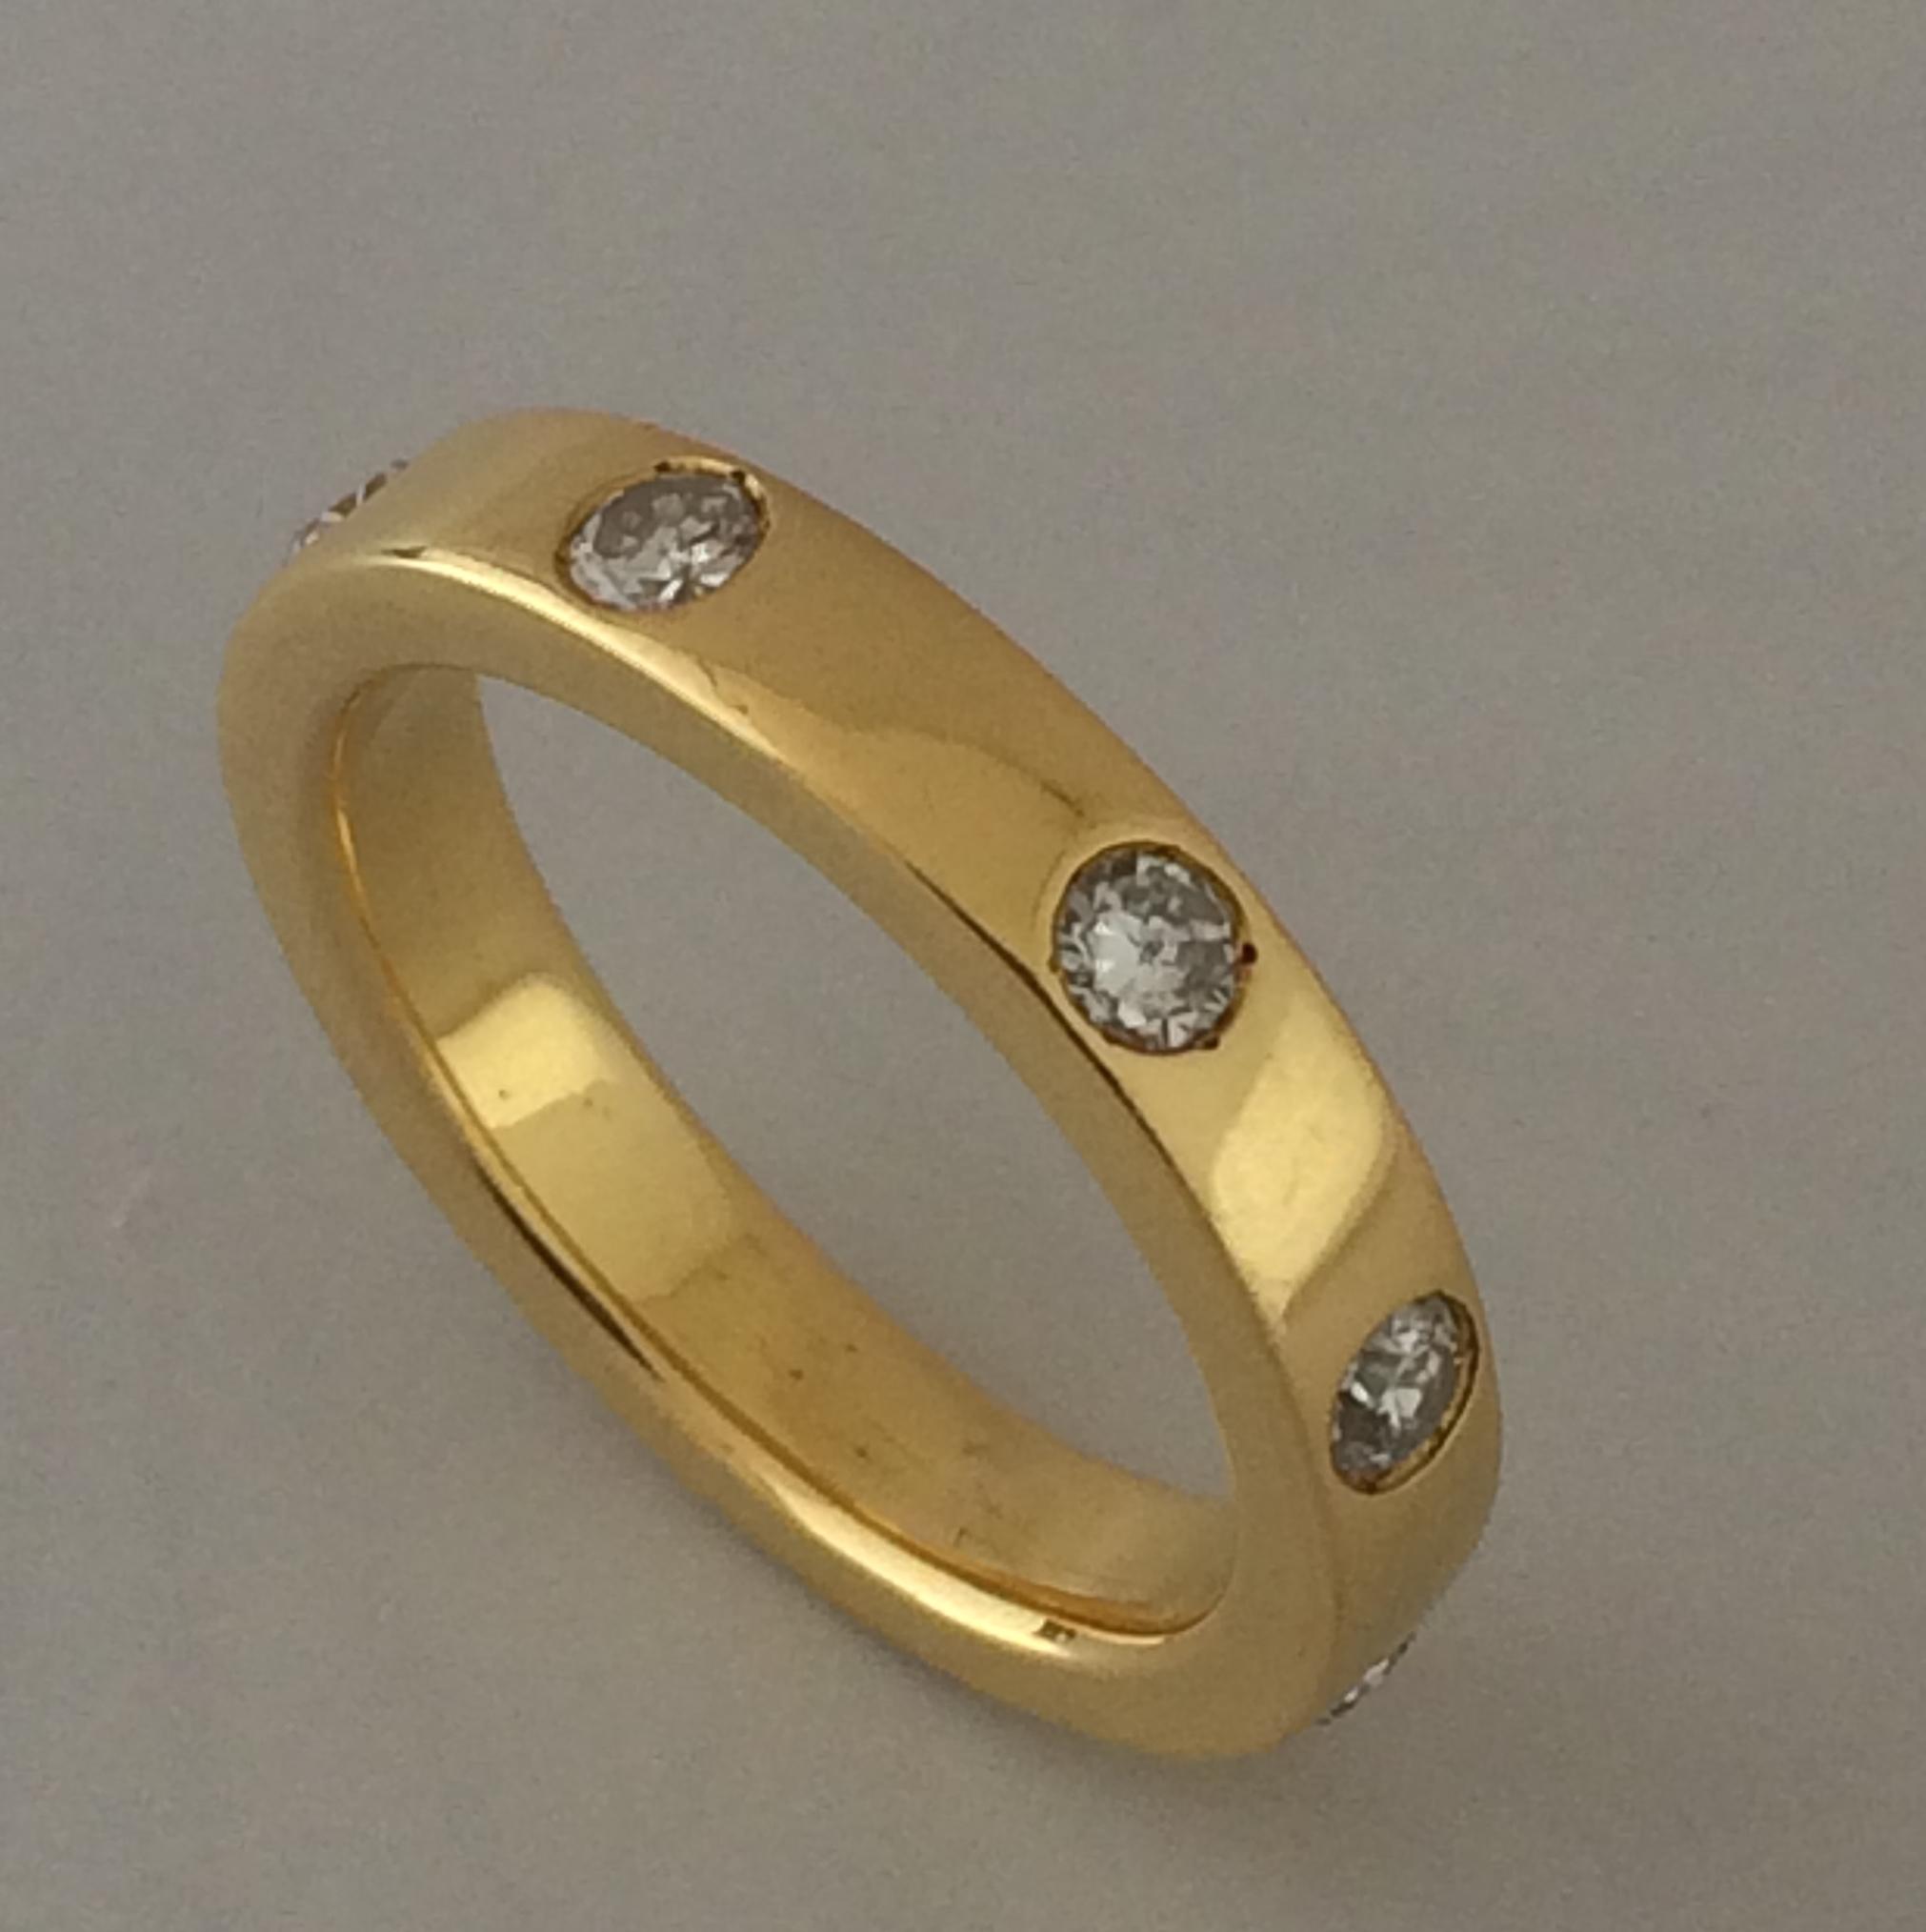 22 karat gold diamond band